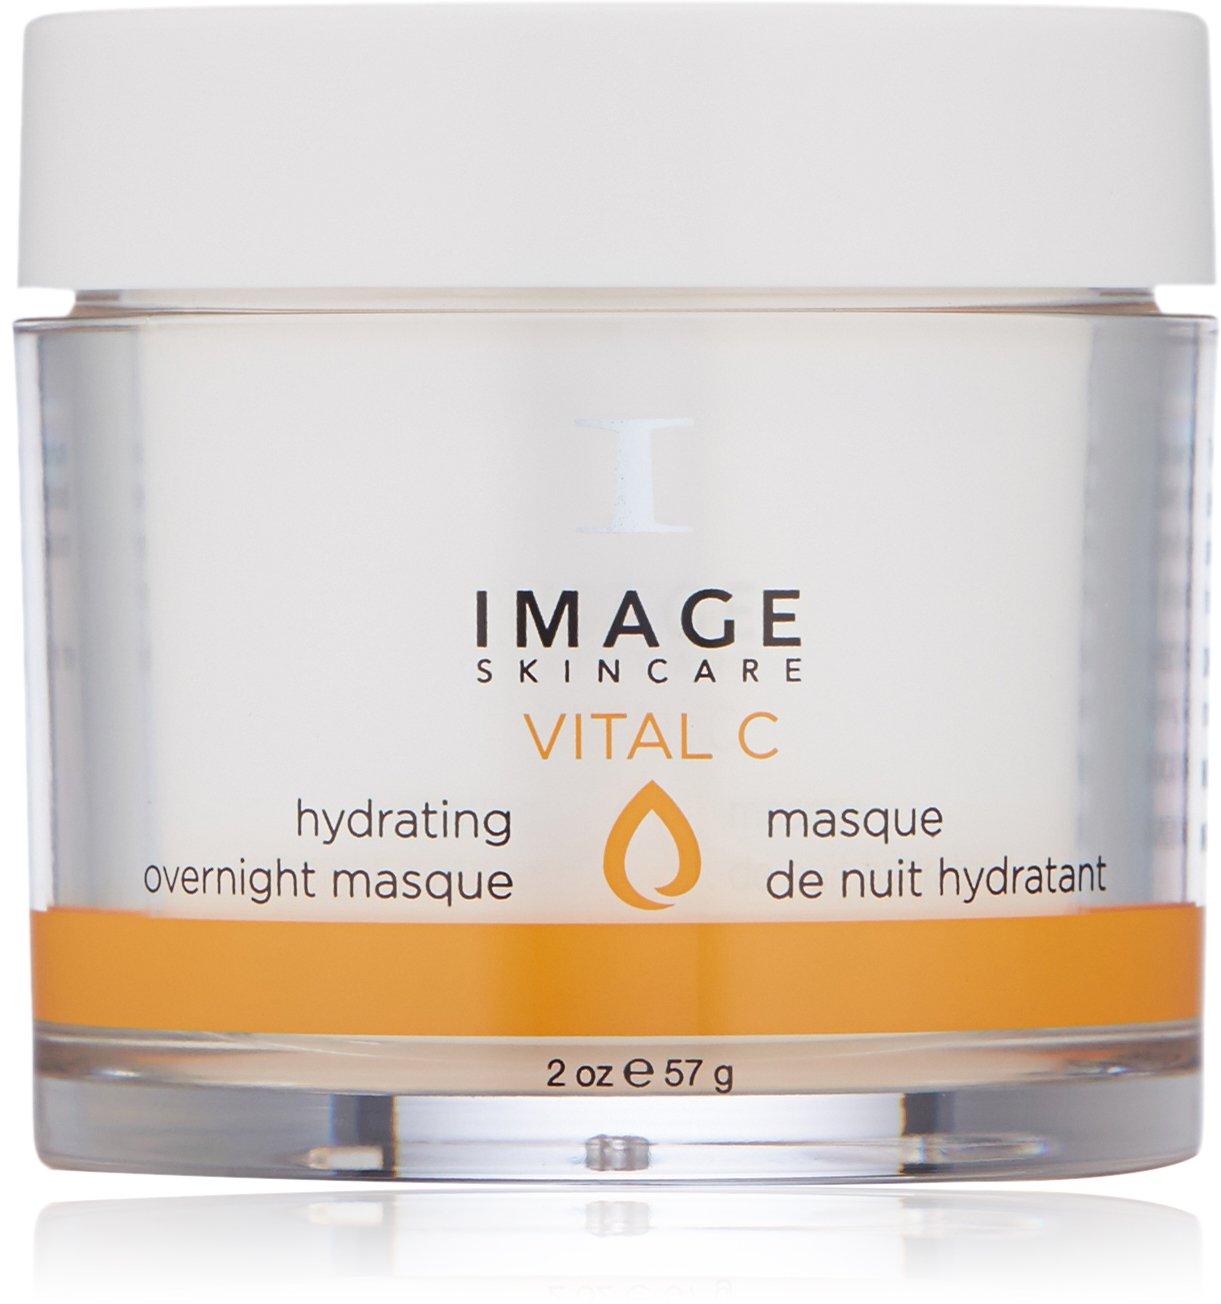 Image Skincare Vital C Hydrating Overnight Masque, 3.2 oz. B07C57YW8M